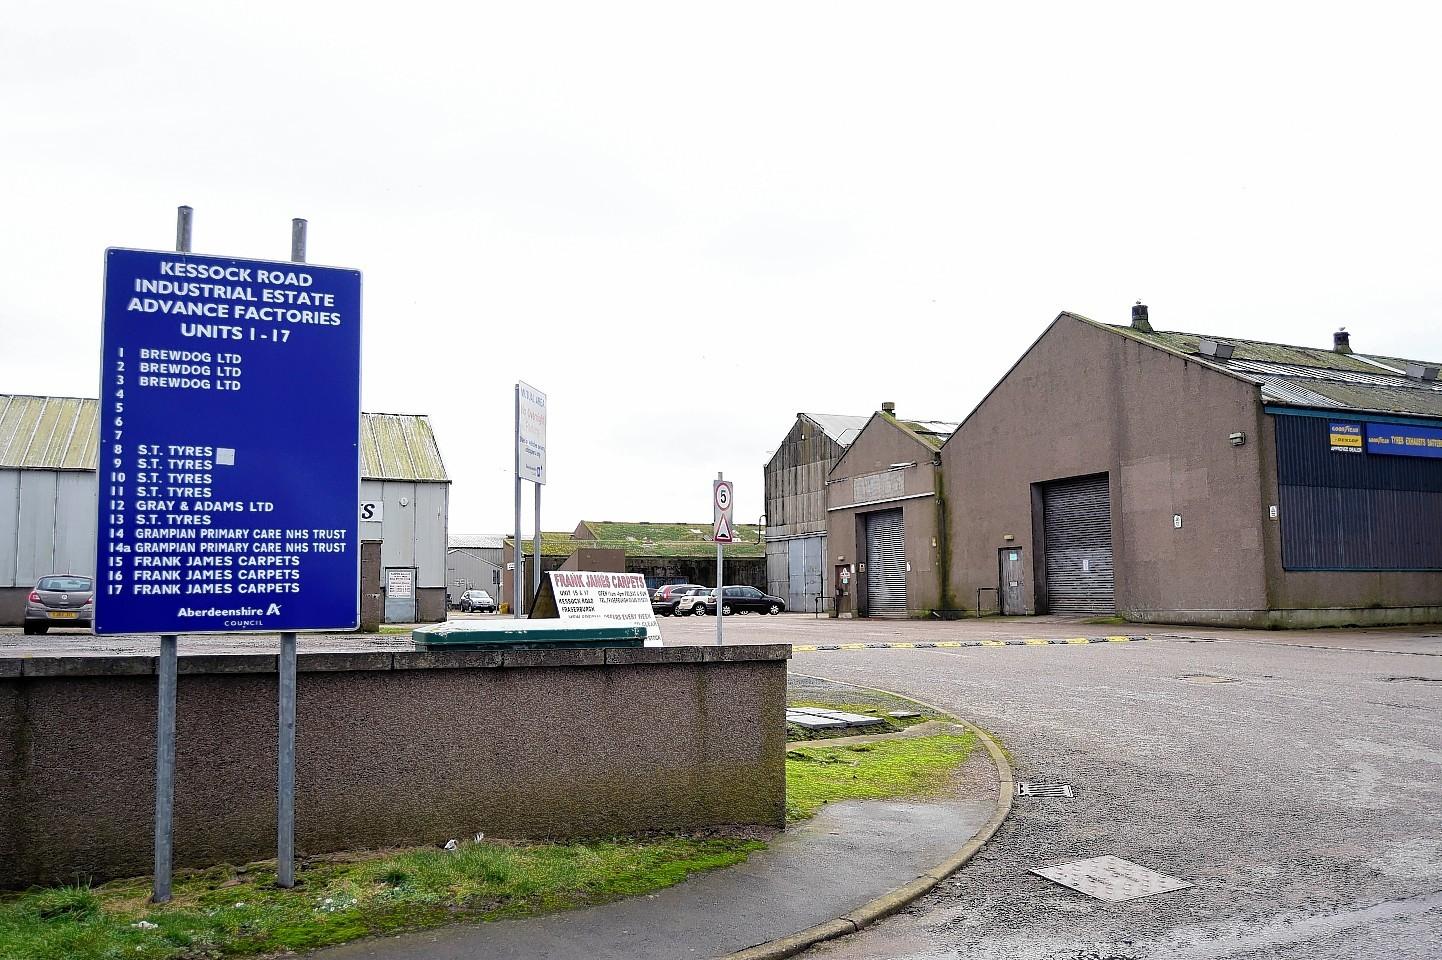 The Kessock Industrial Estate.